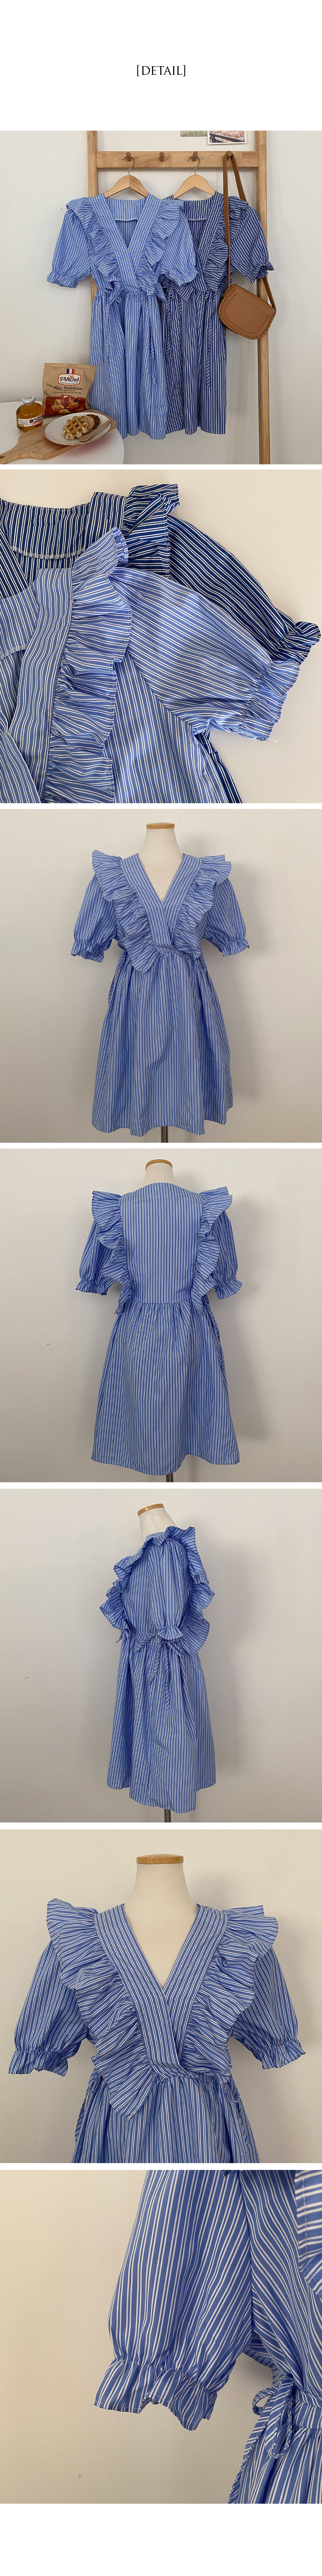 Fury lace side ribbon stripe Dress